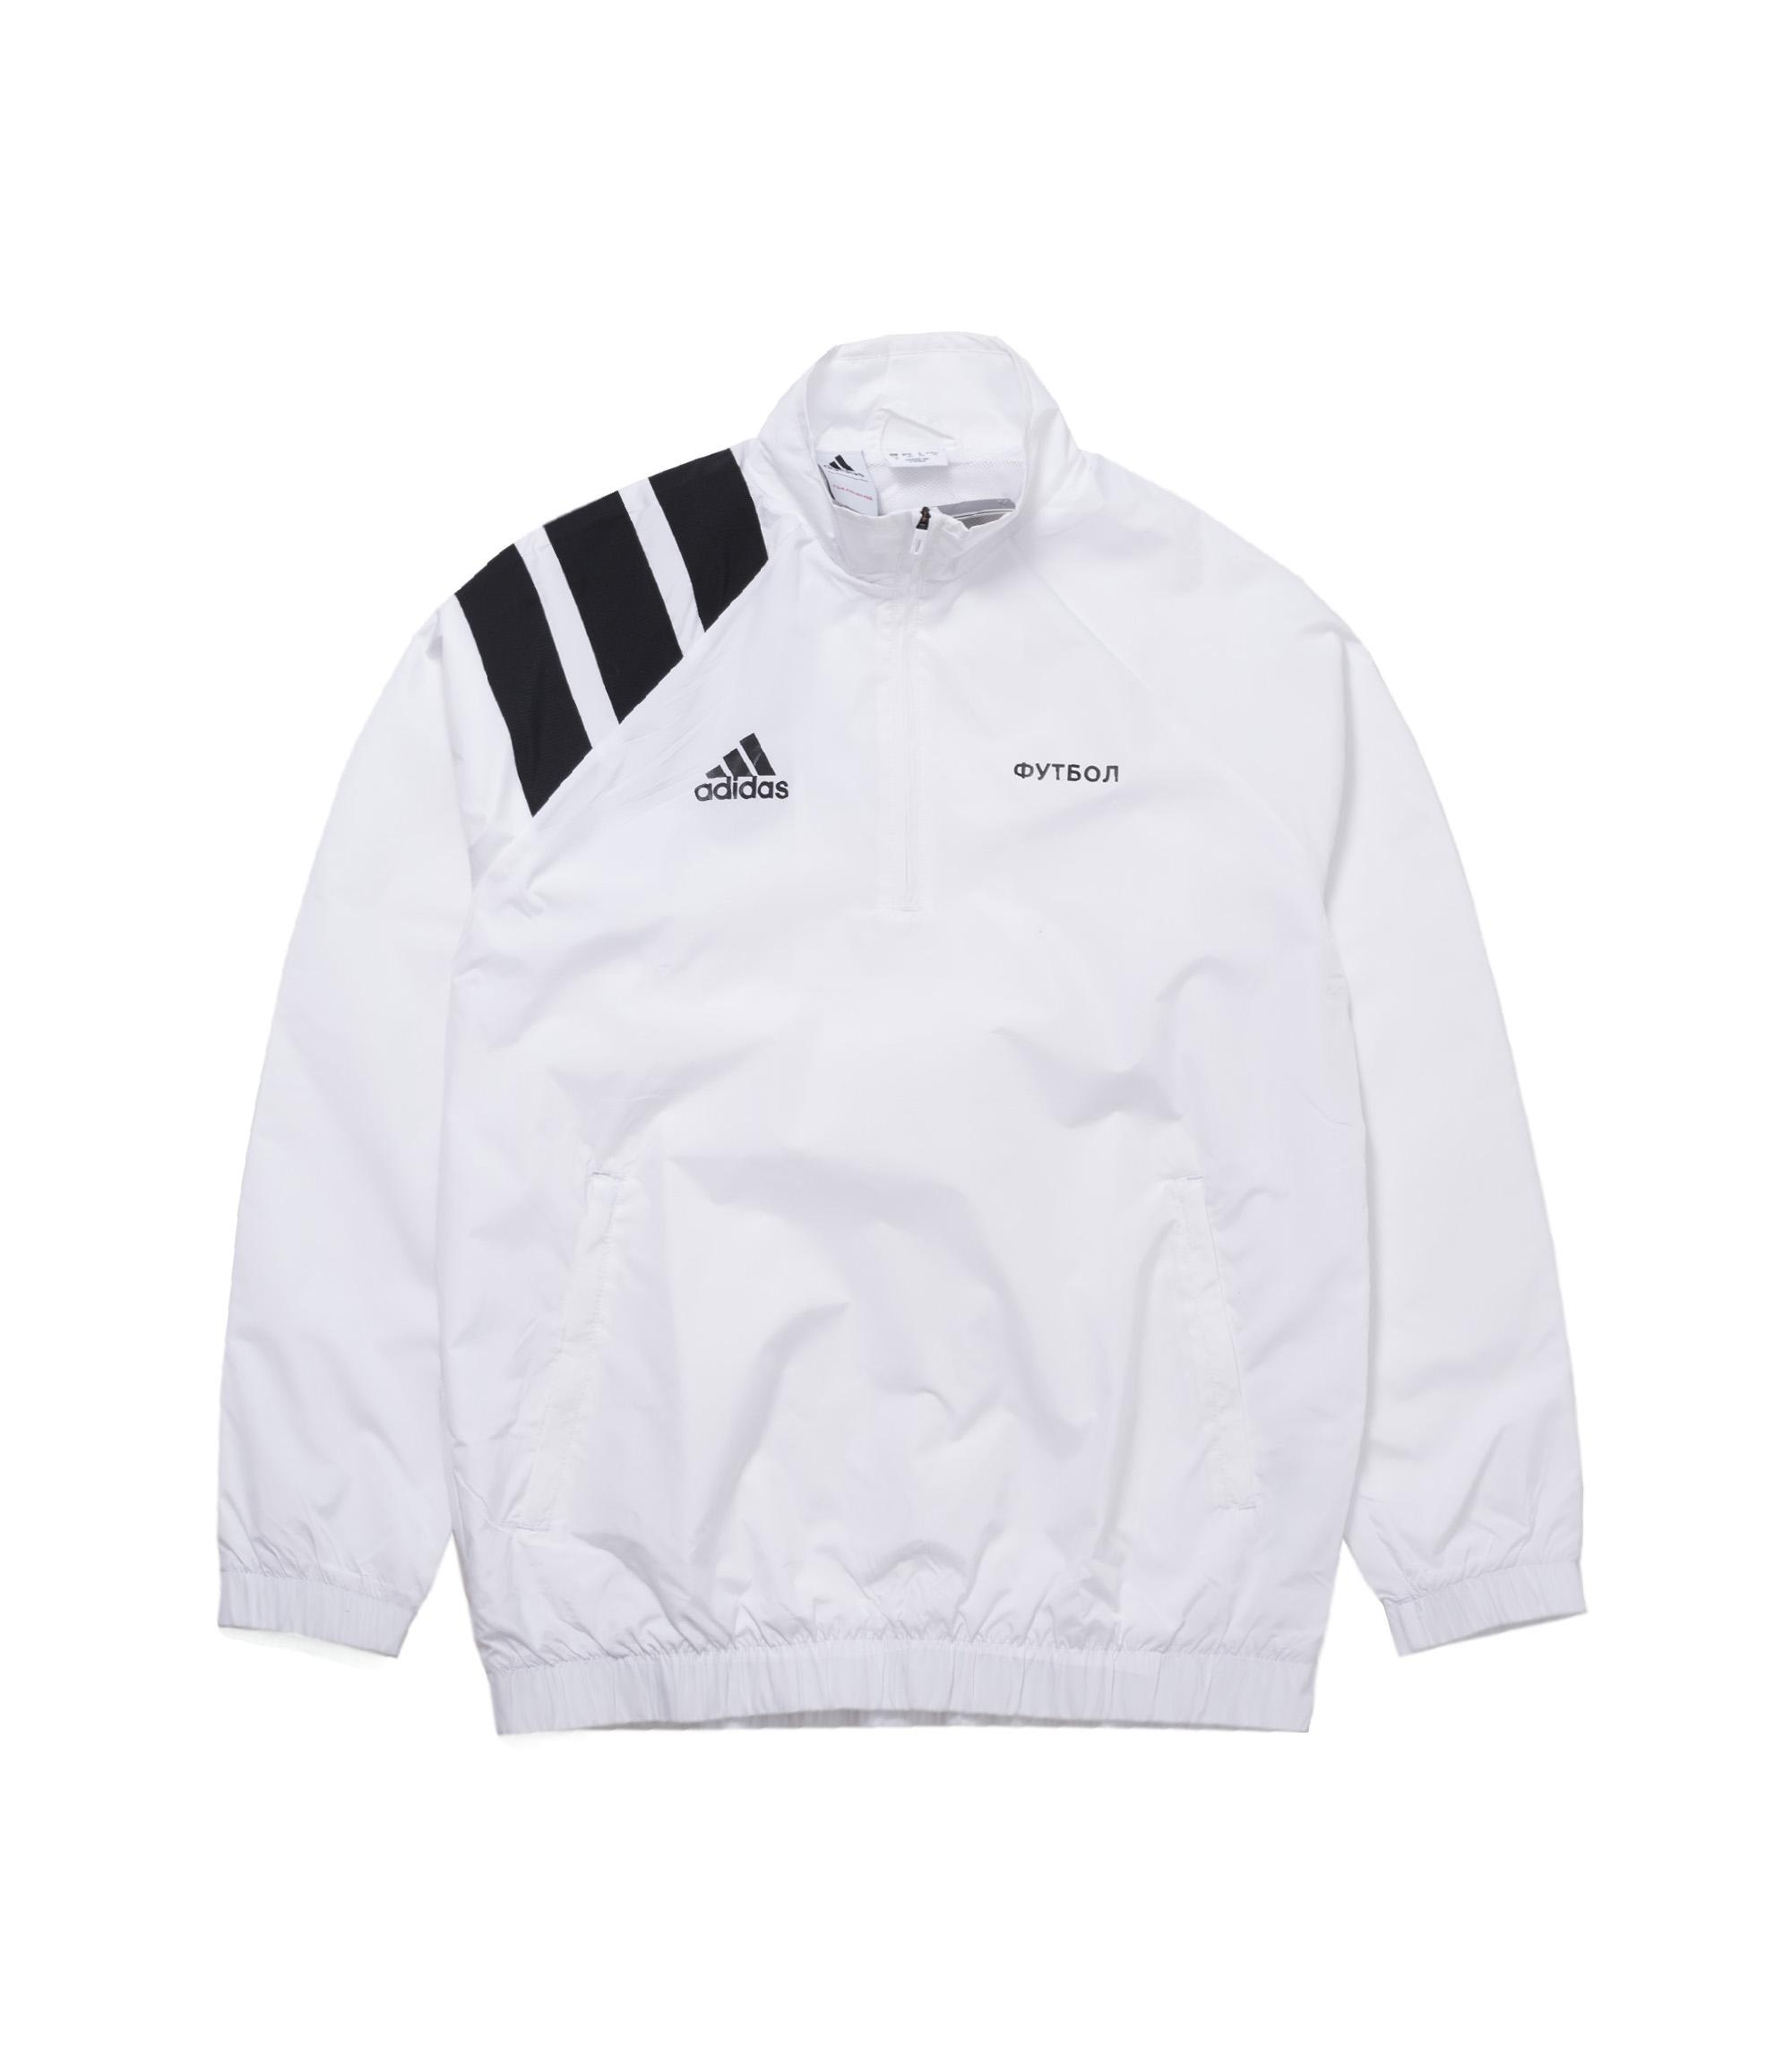 Adidas × Gosha Rubchinskiy Sweater Rot Schwarz M